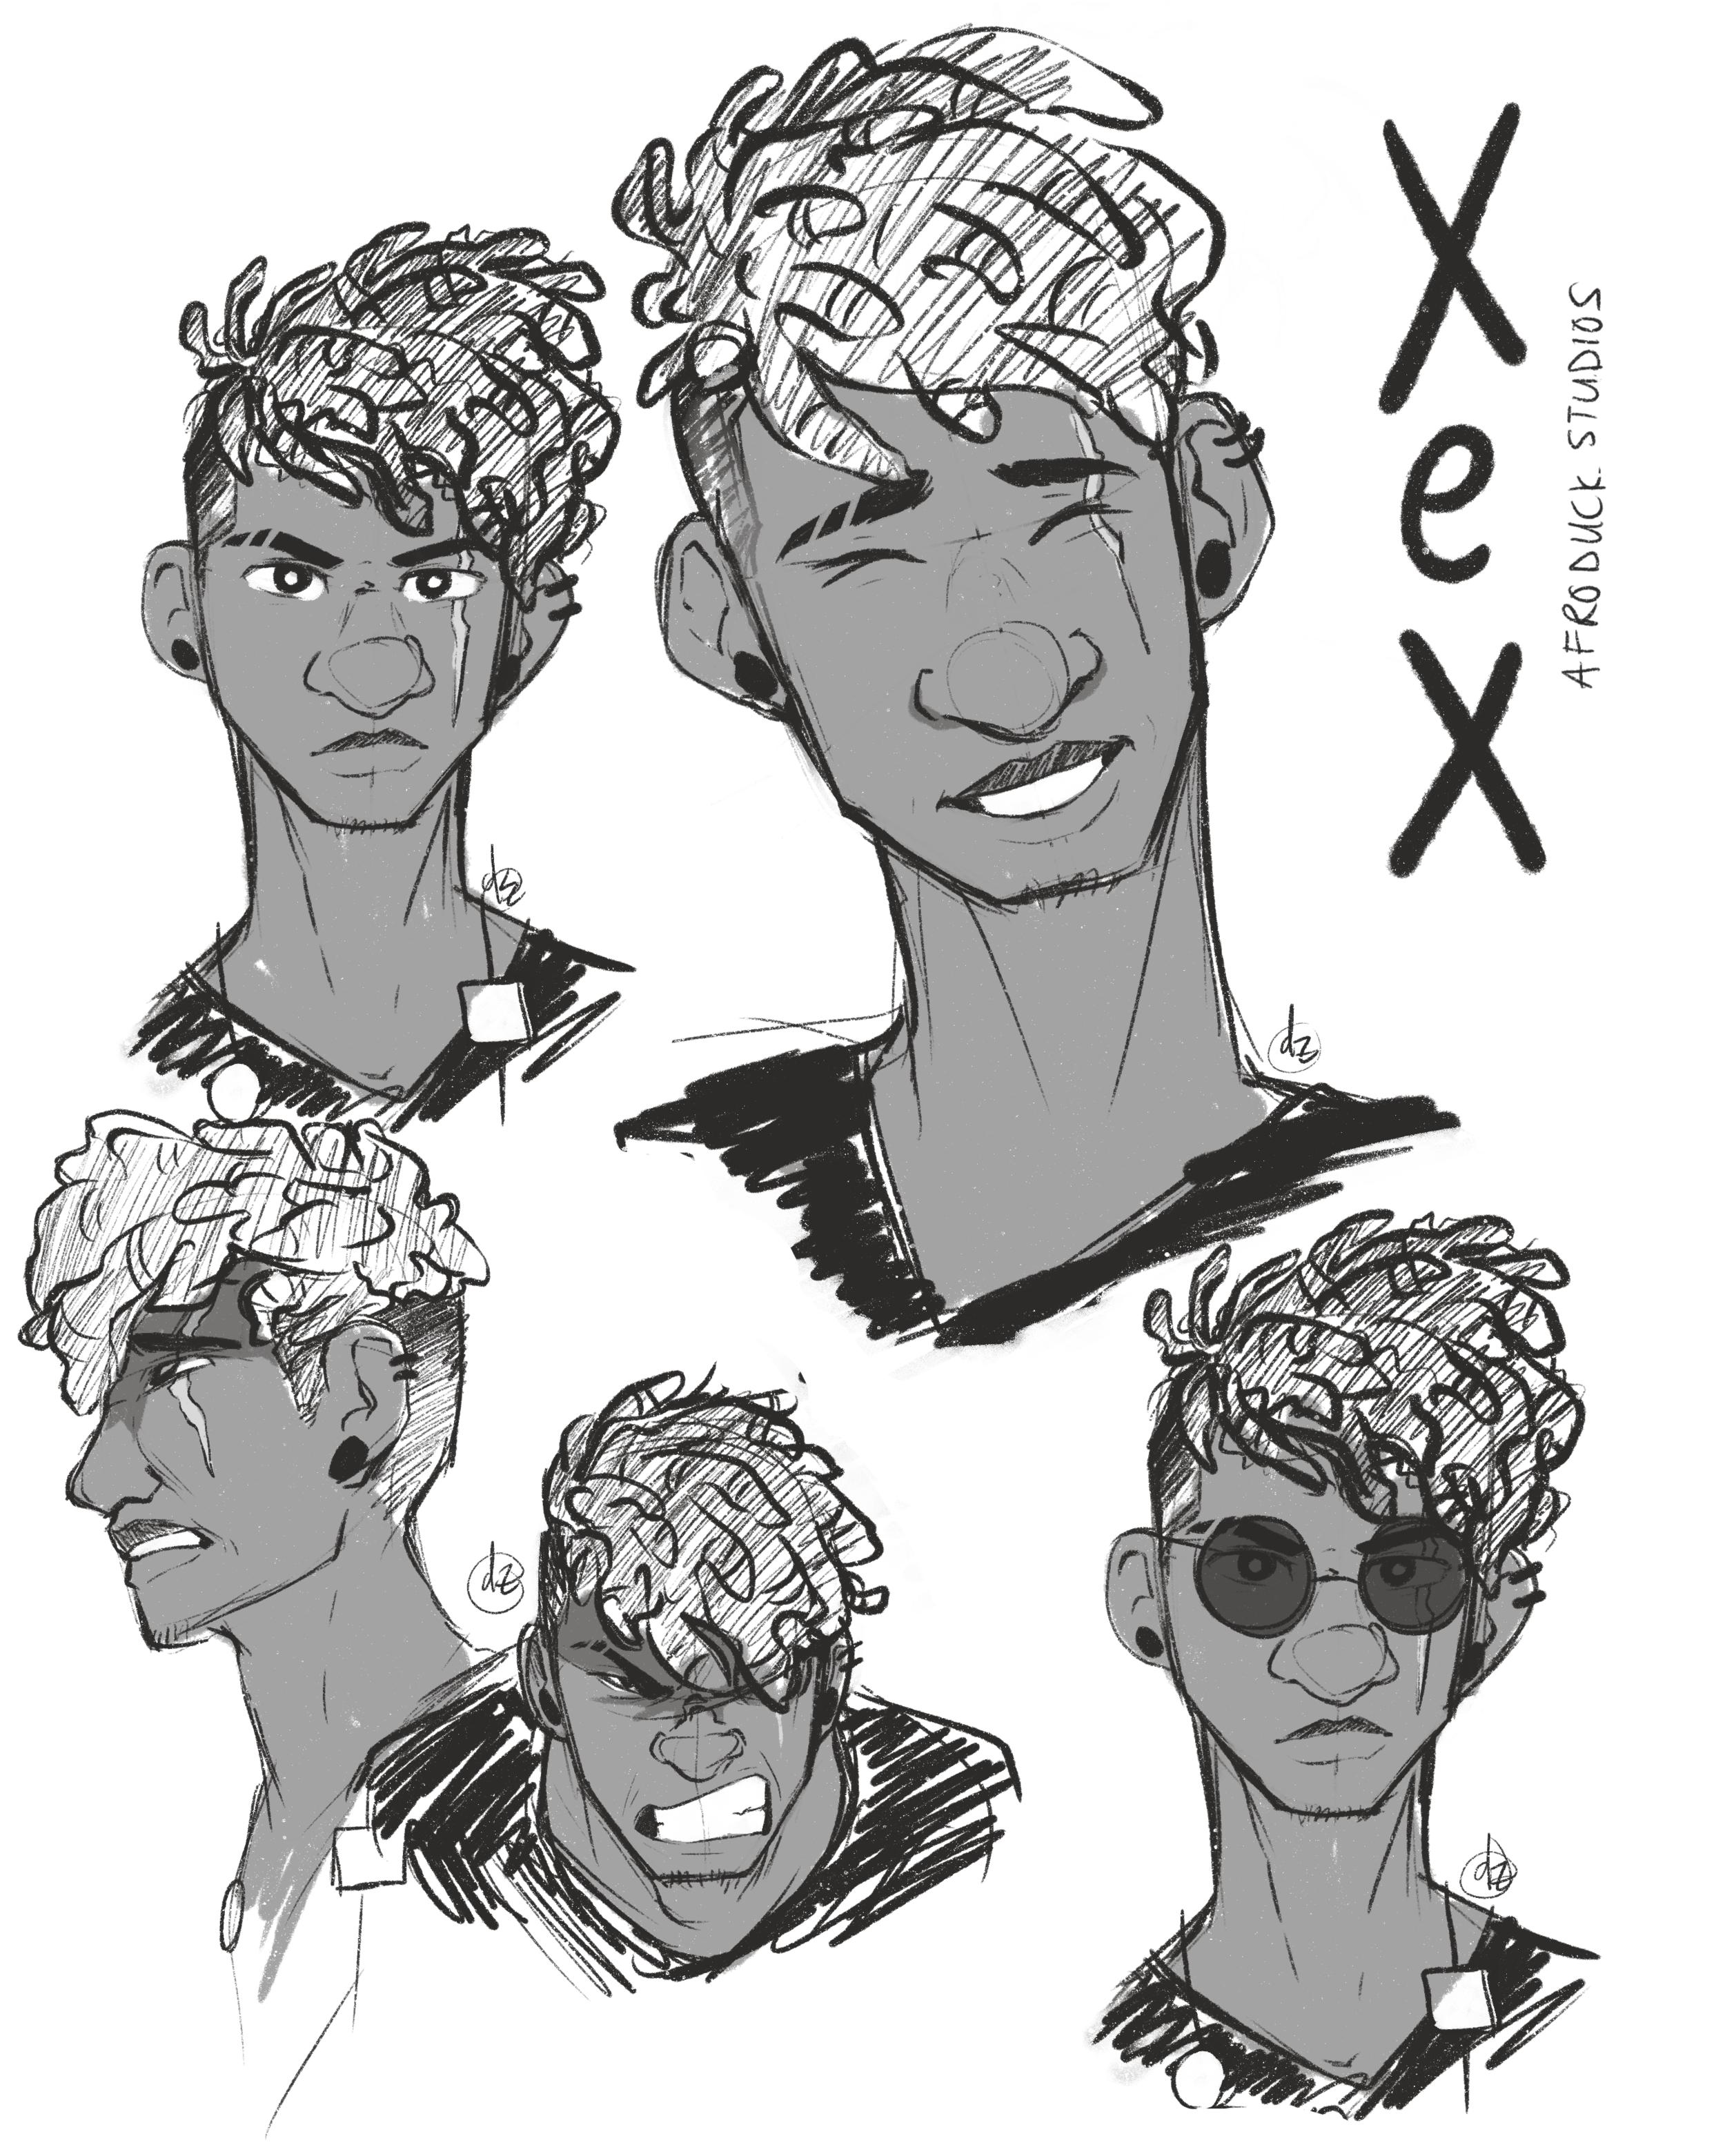 Xex Yaw Nkrumah (Portrait)